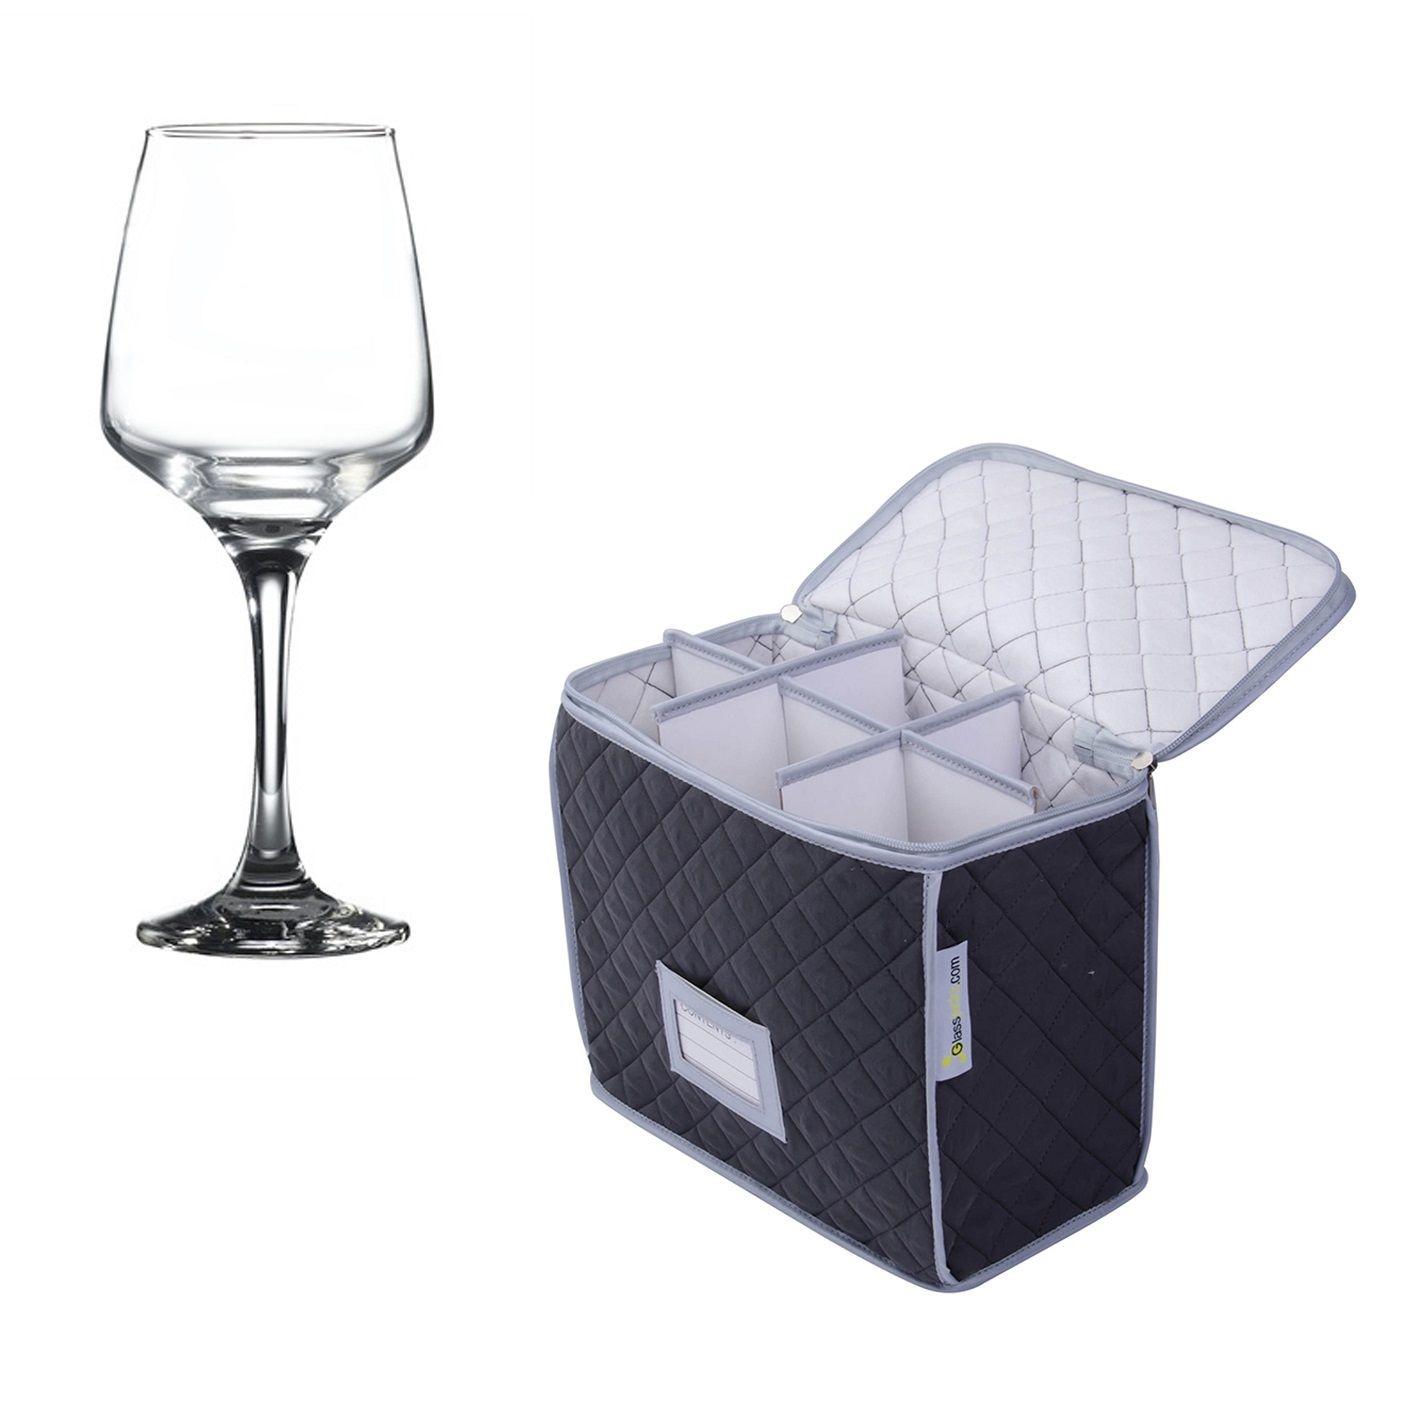 lal_wine_glass